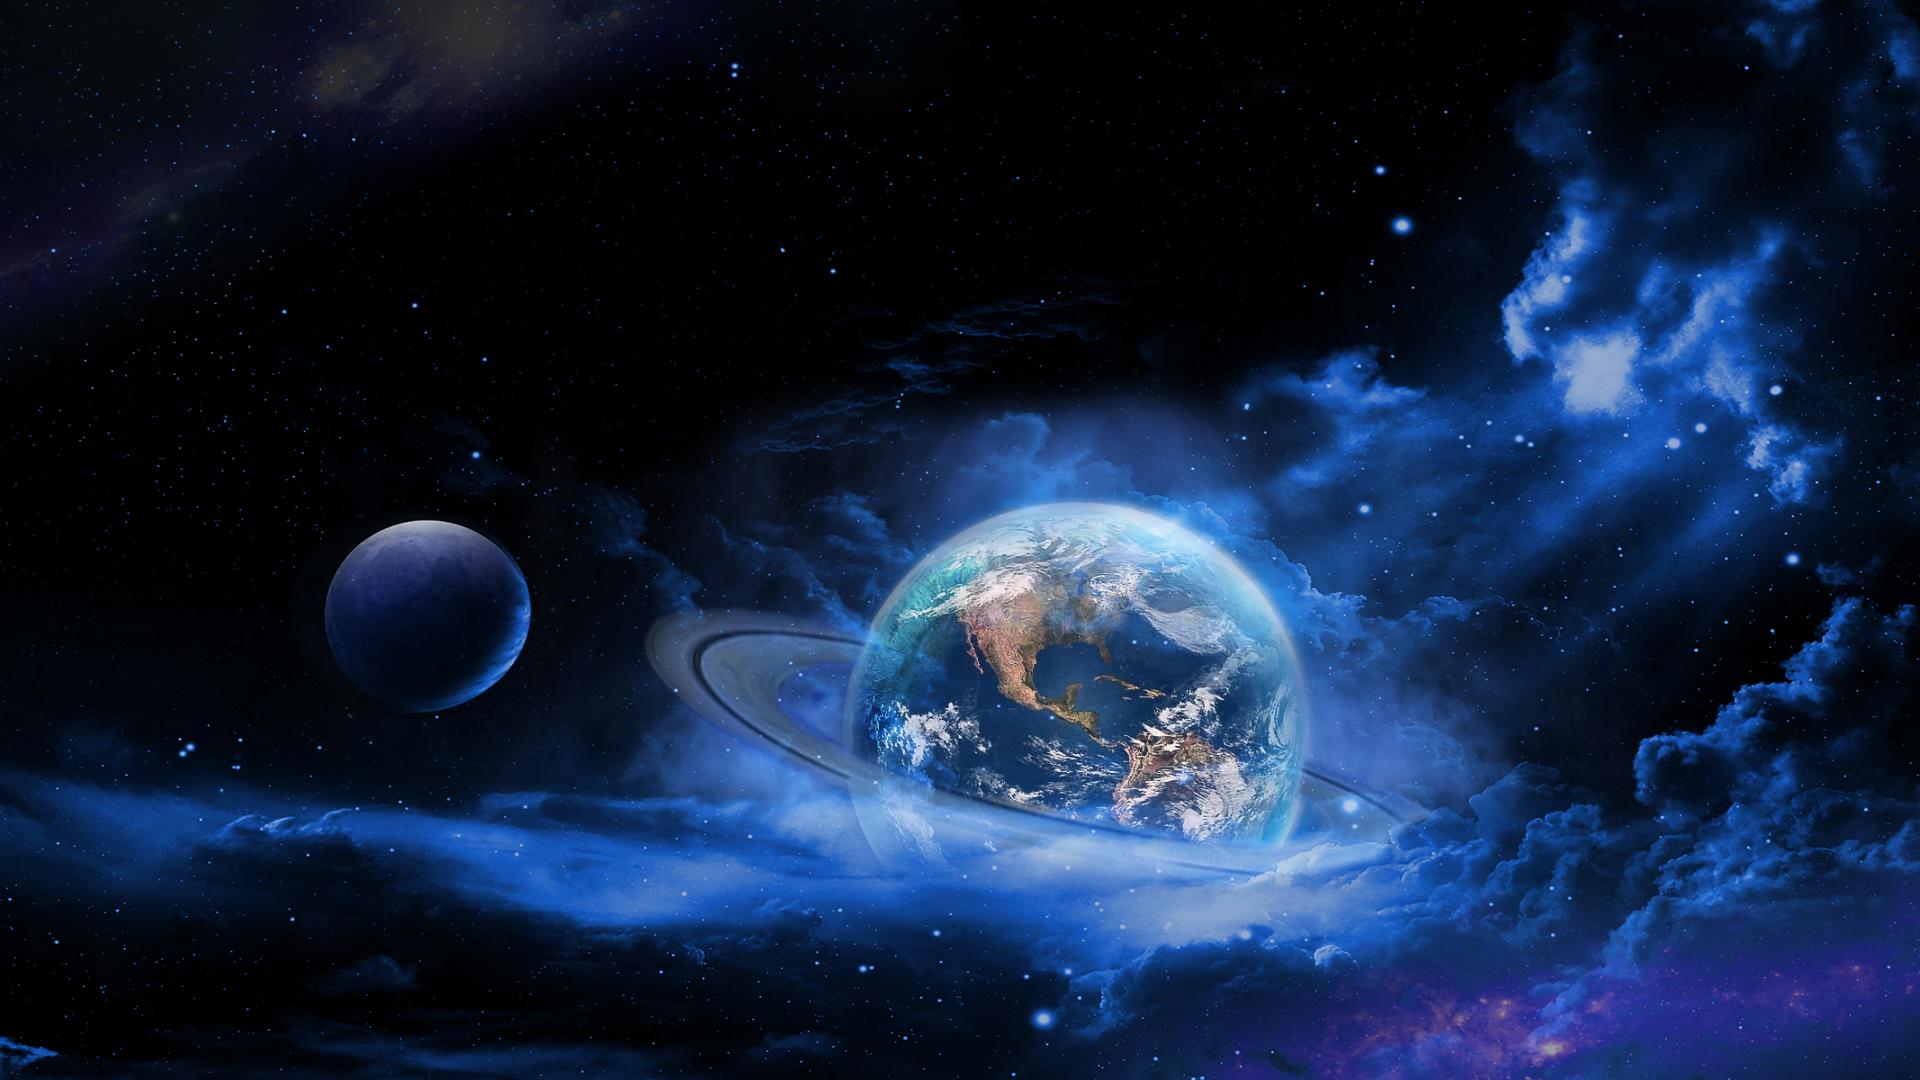 Planète Fond d'écran HD | Arrière-Plan | 1920x1080 | ID:807139 - Wallpaper Abyss